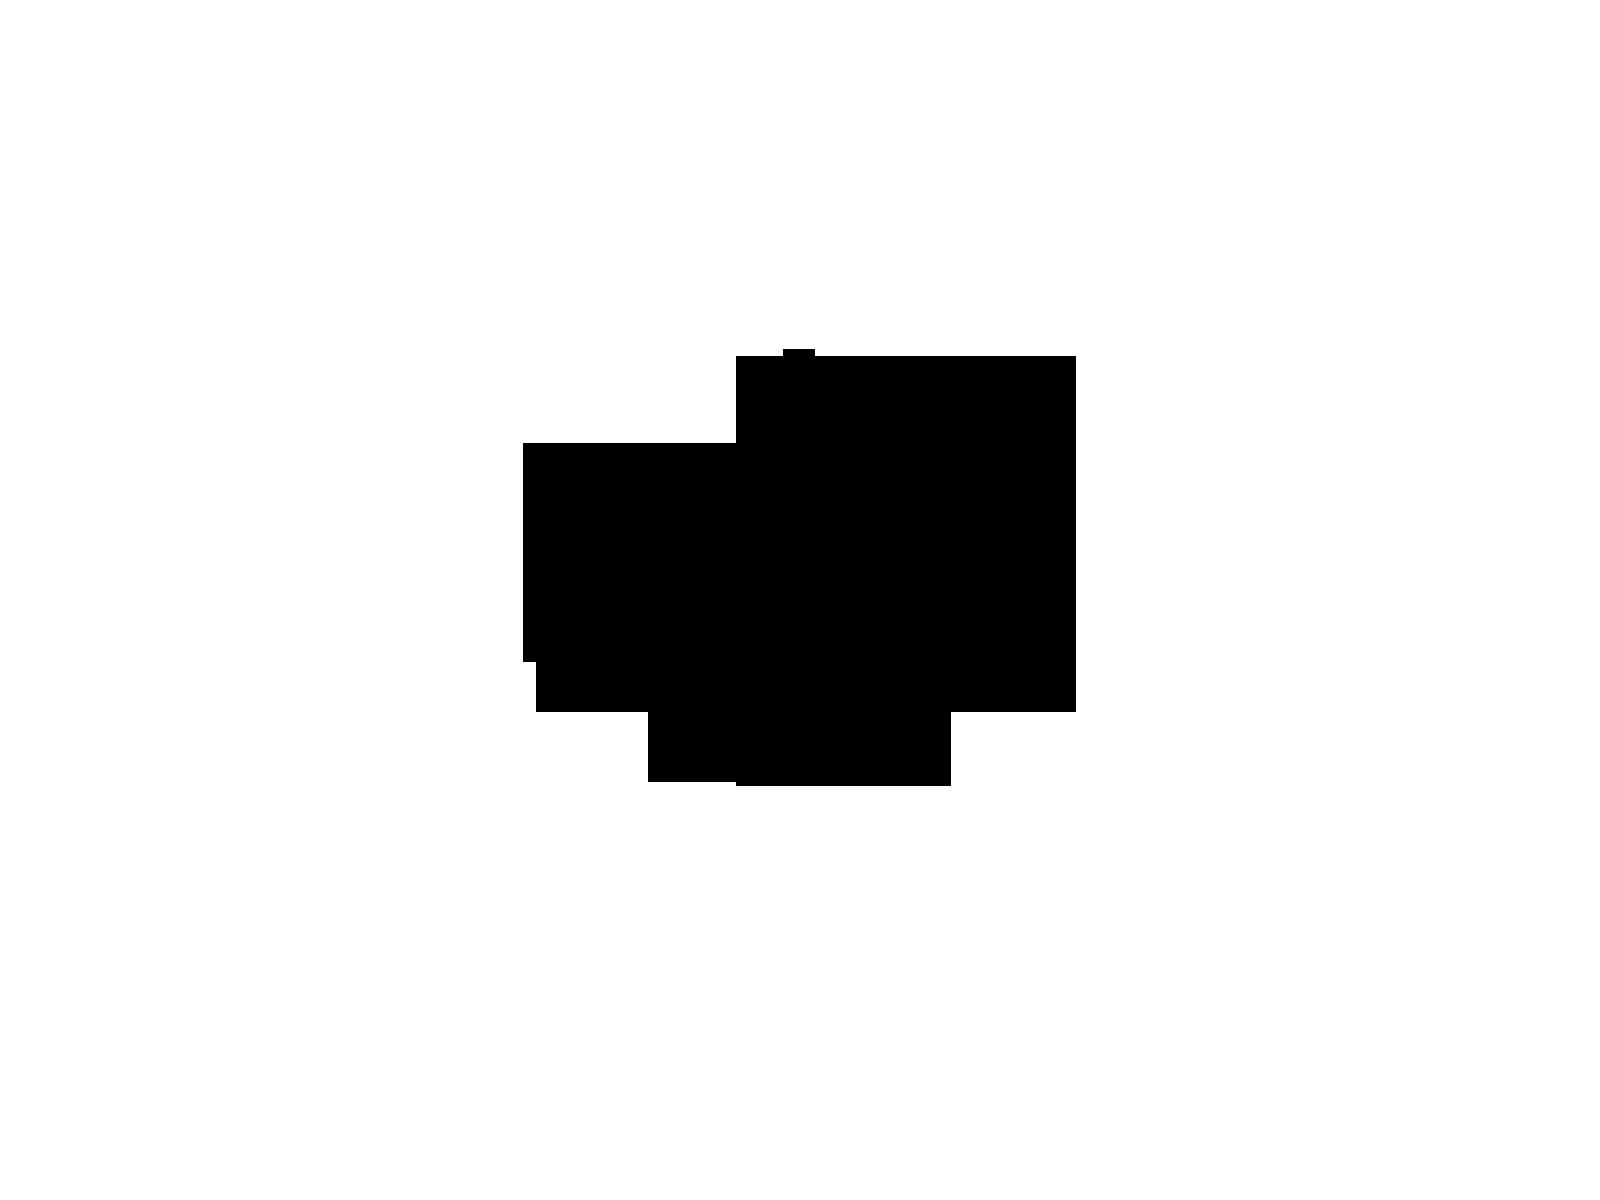 1600x1200 Free Png Clipart Hallmark